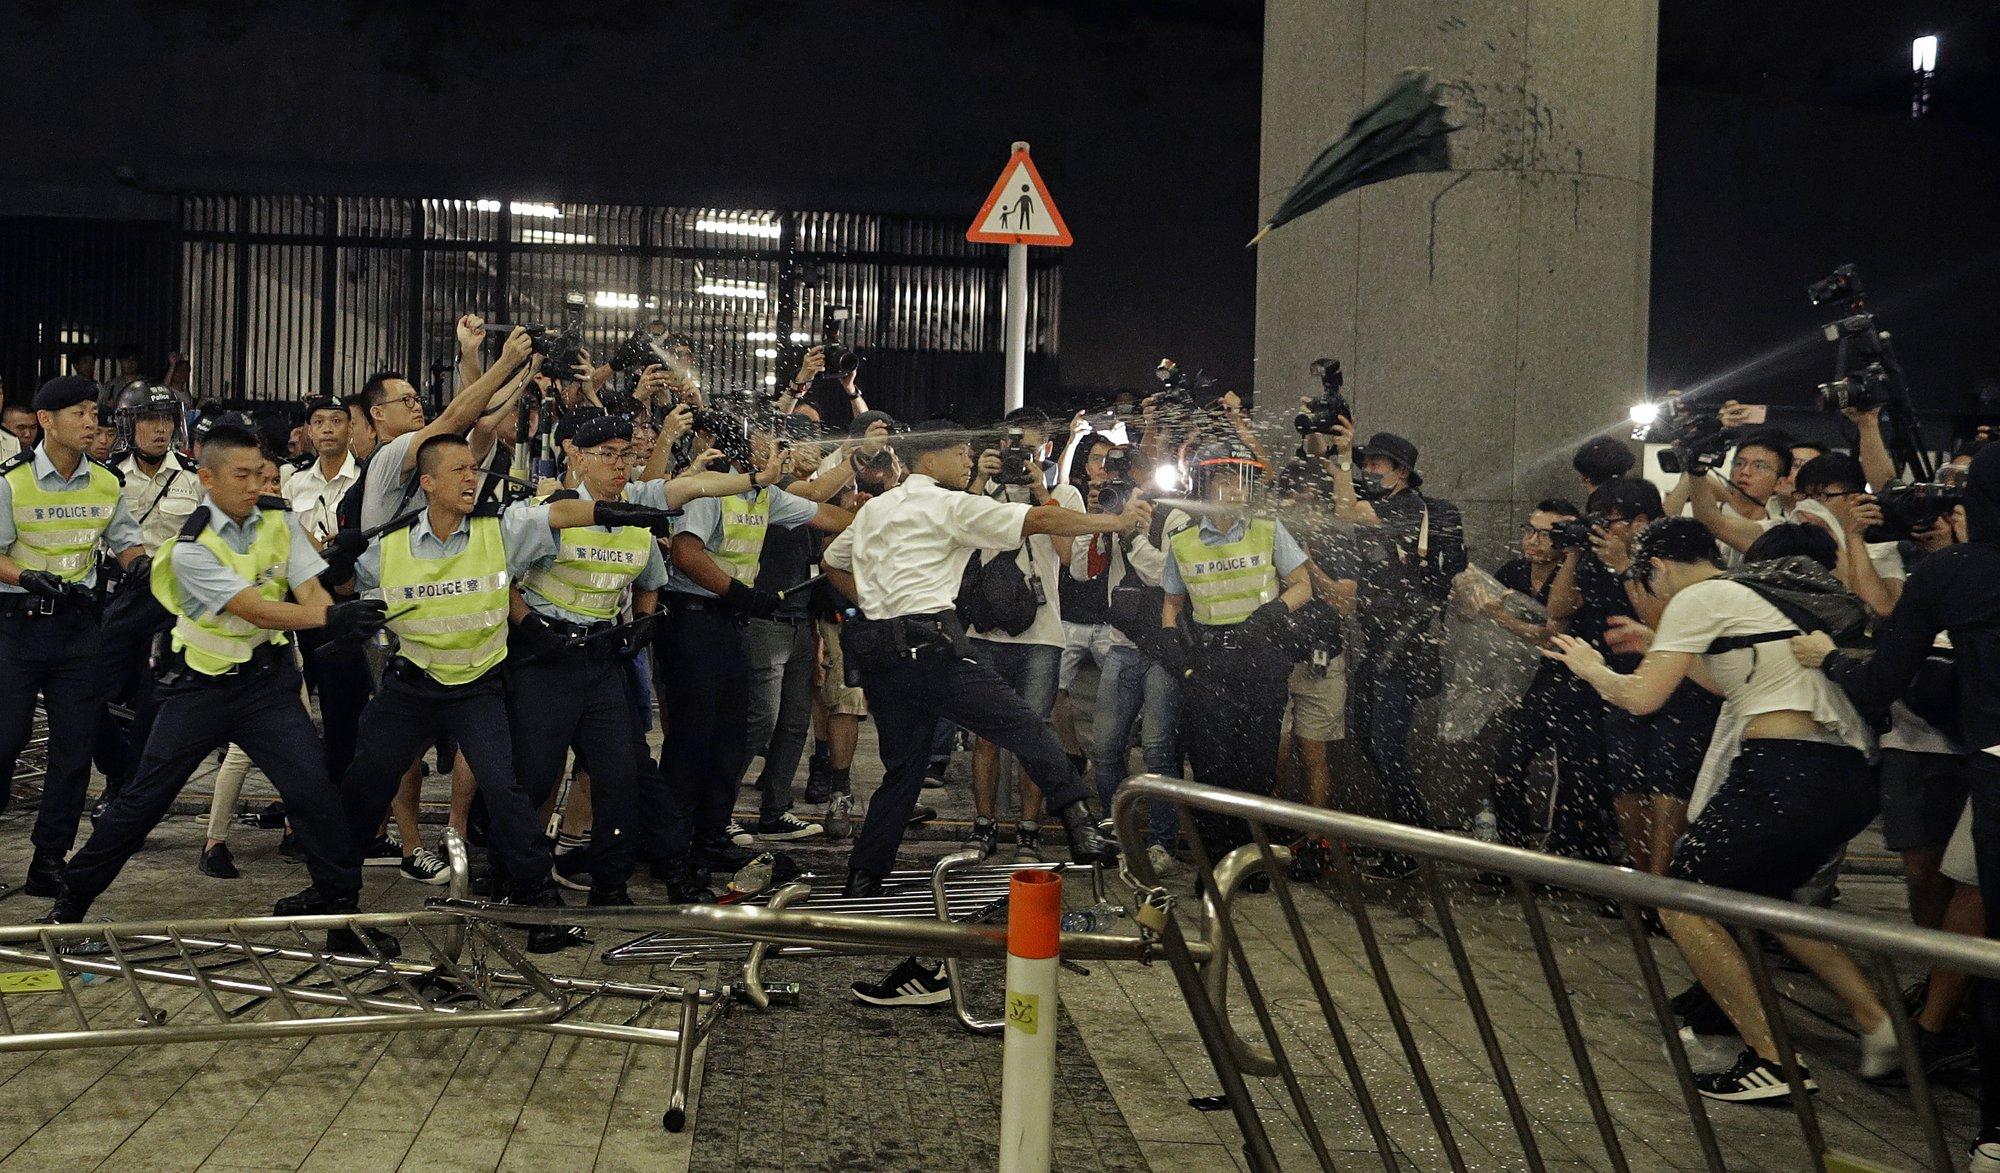 Extradition bill pushes Hong Kong to a political crisis